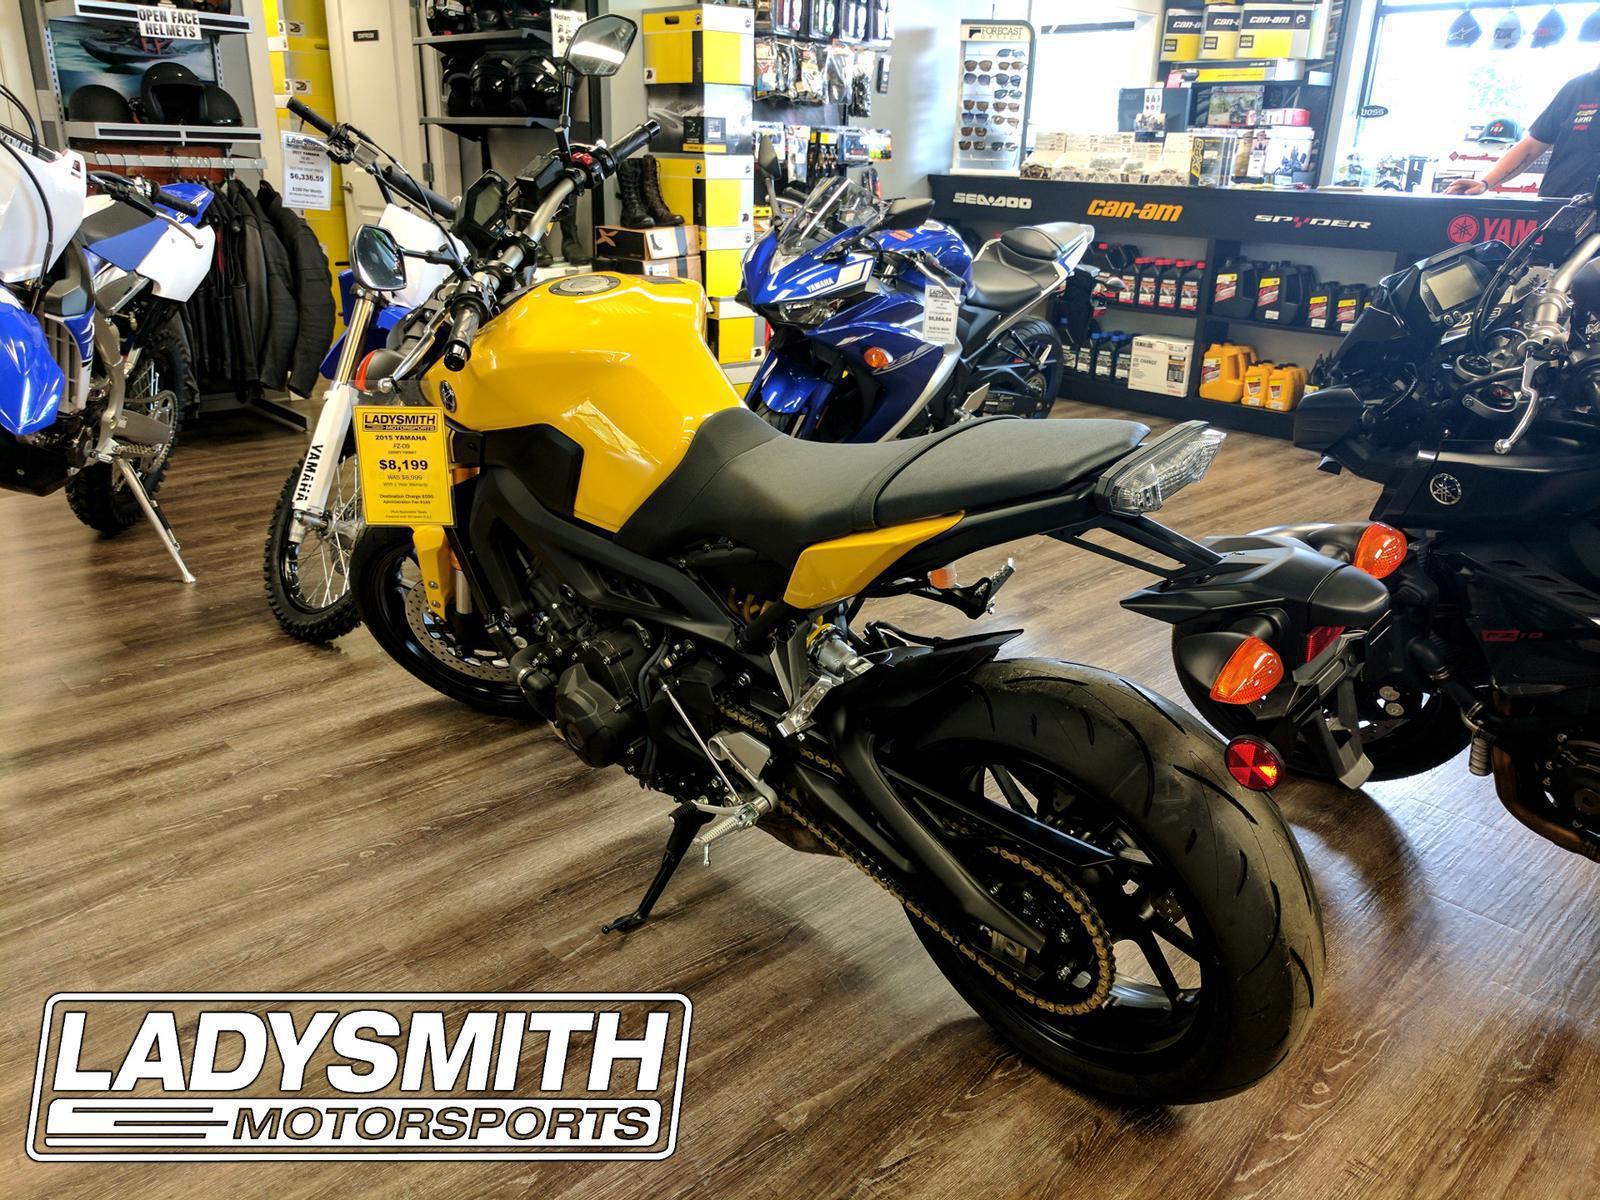 2015 Yamaha FZ-09 for sale in Ladysmith, BC  Ladysmith Motorsports